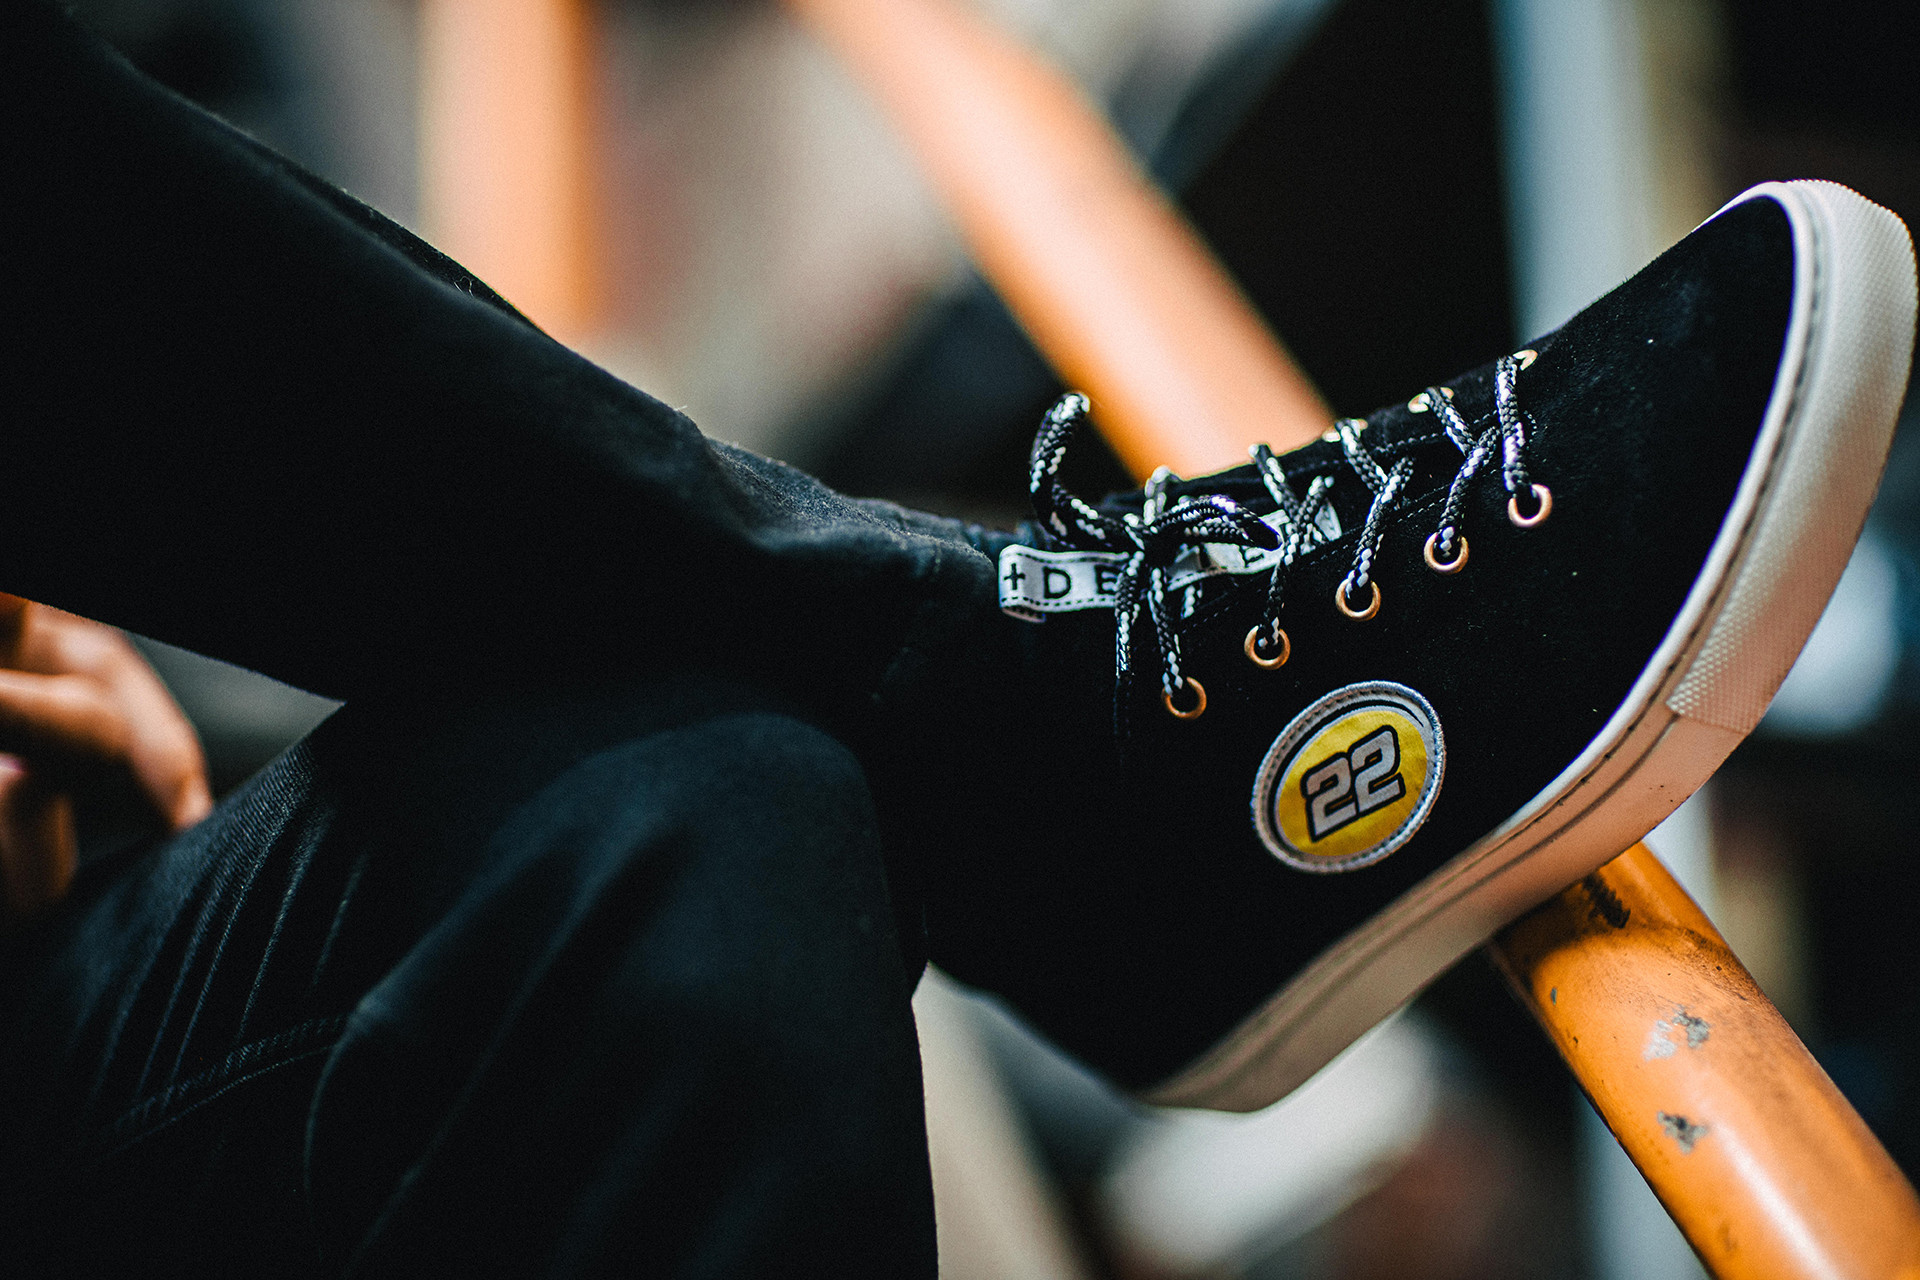 Jenson Button Duke + Dexter DRAKE Black 22 Racing Sneakers